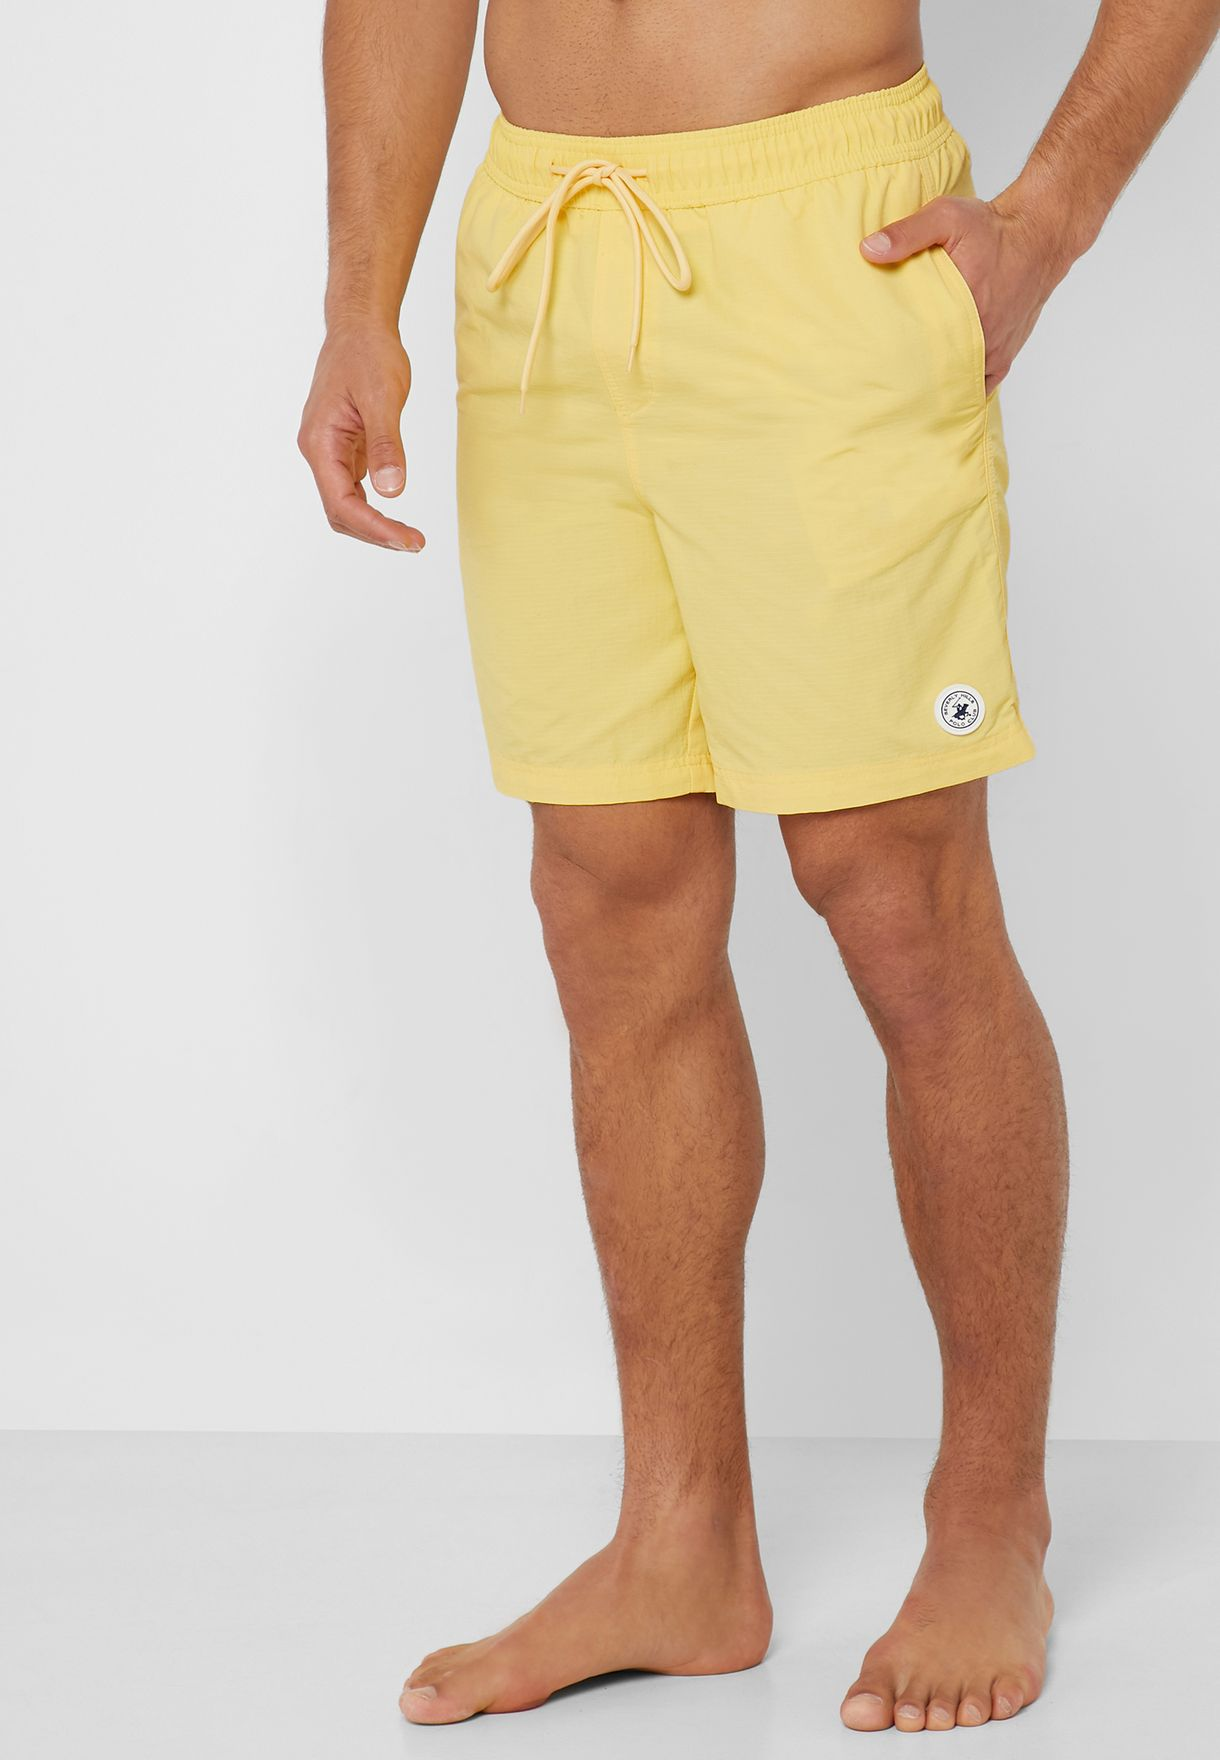 8750fe5a67 Shop Beverly Hills Polo Club yellow Nylon Solid Swim Shorts BHPC4035 ...